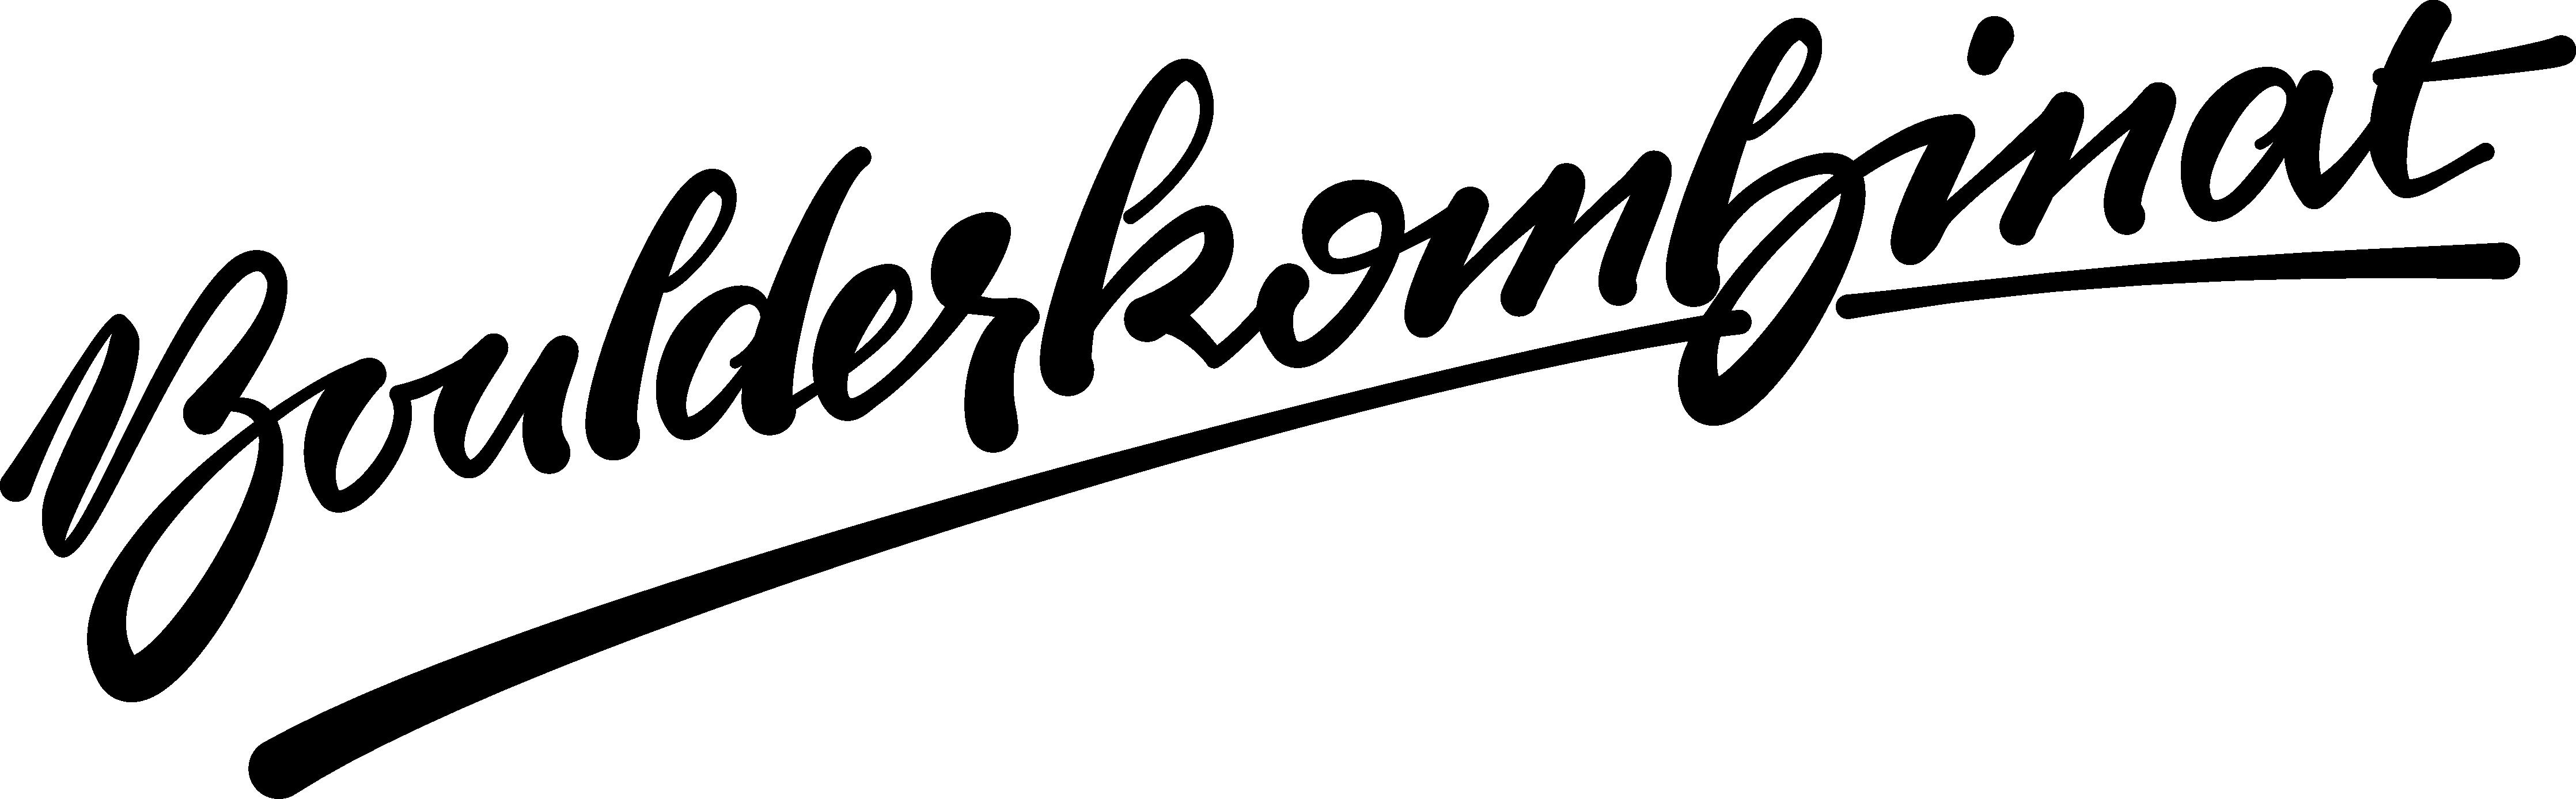 Boulderkombinat